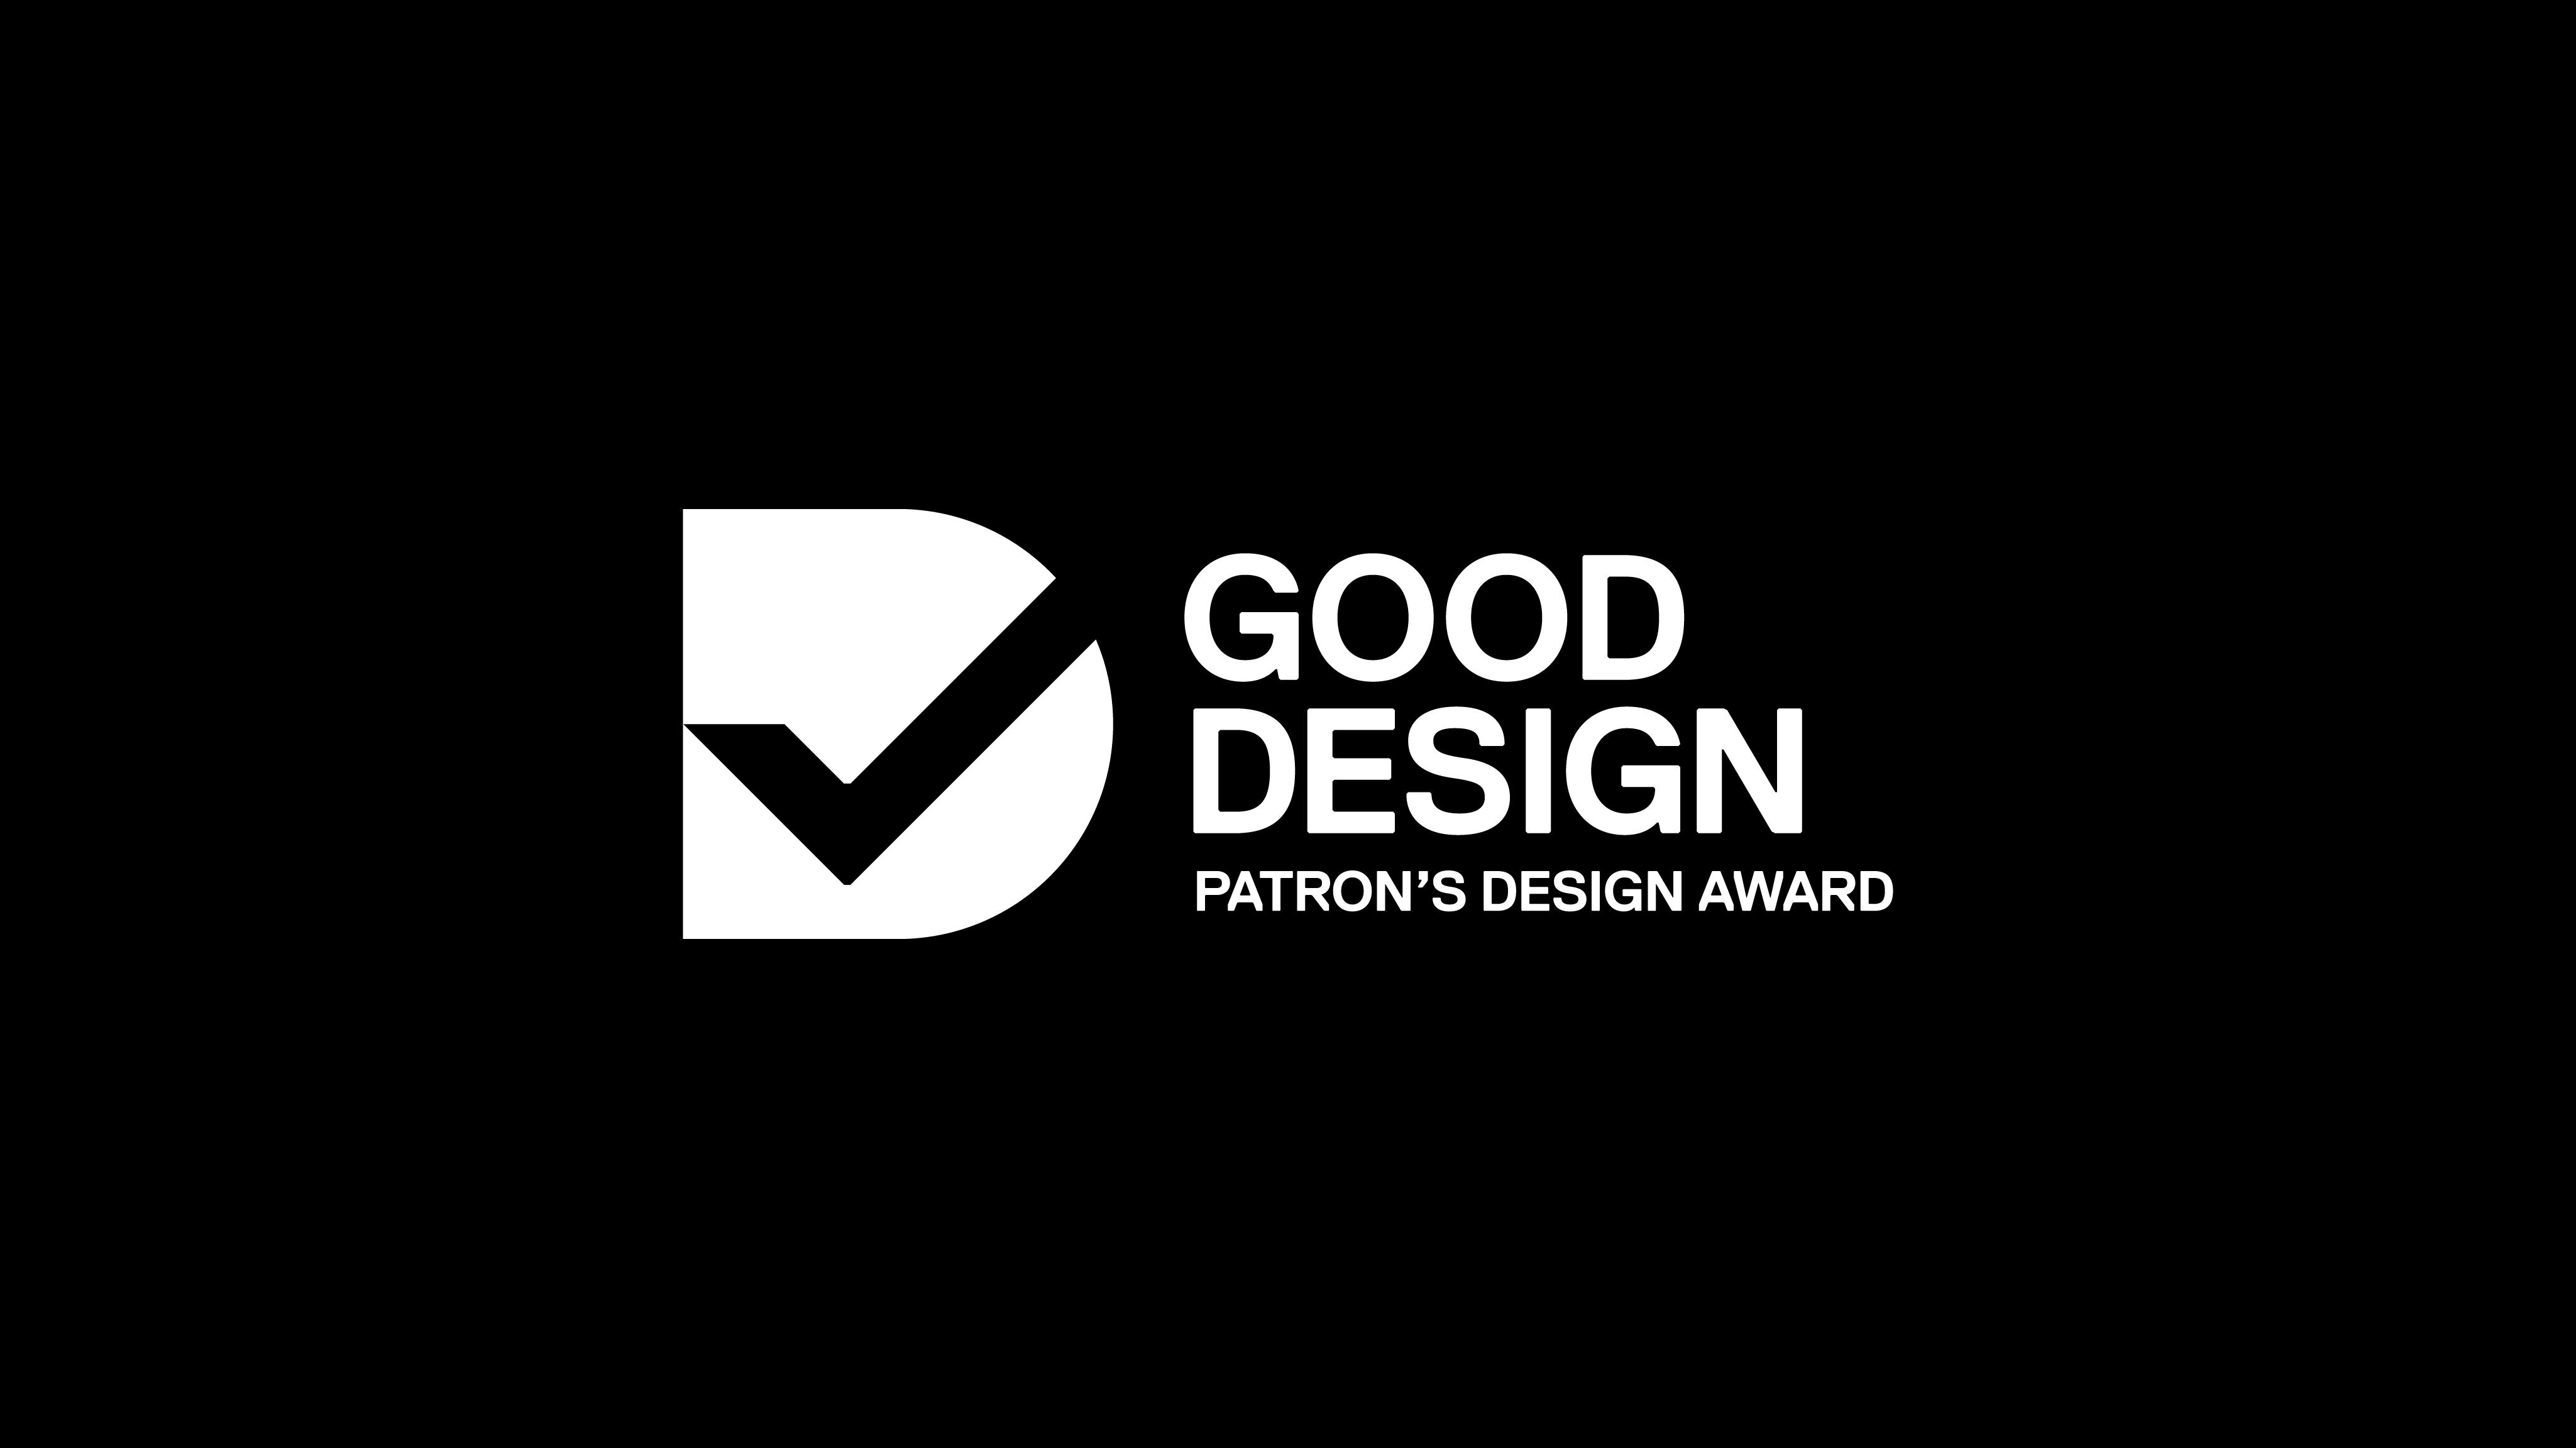 Michael Bryce Patron's Award